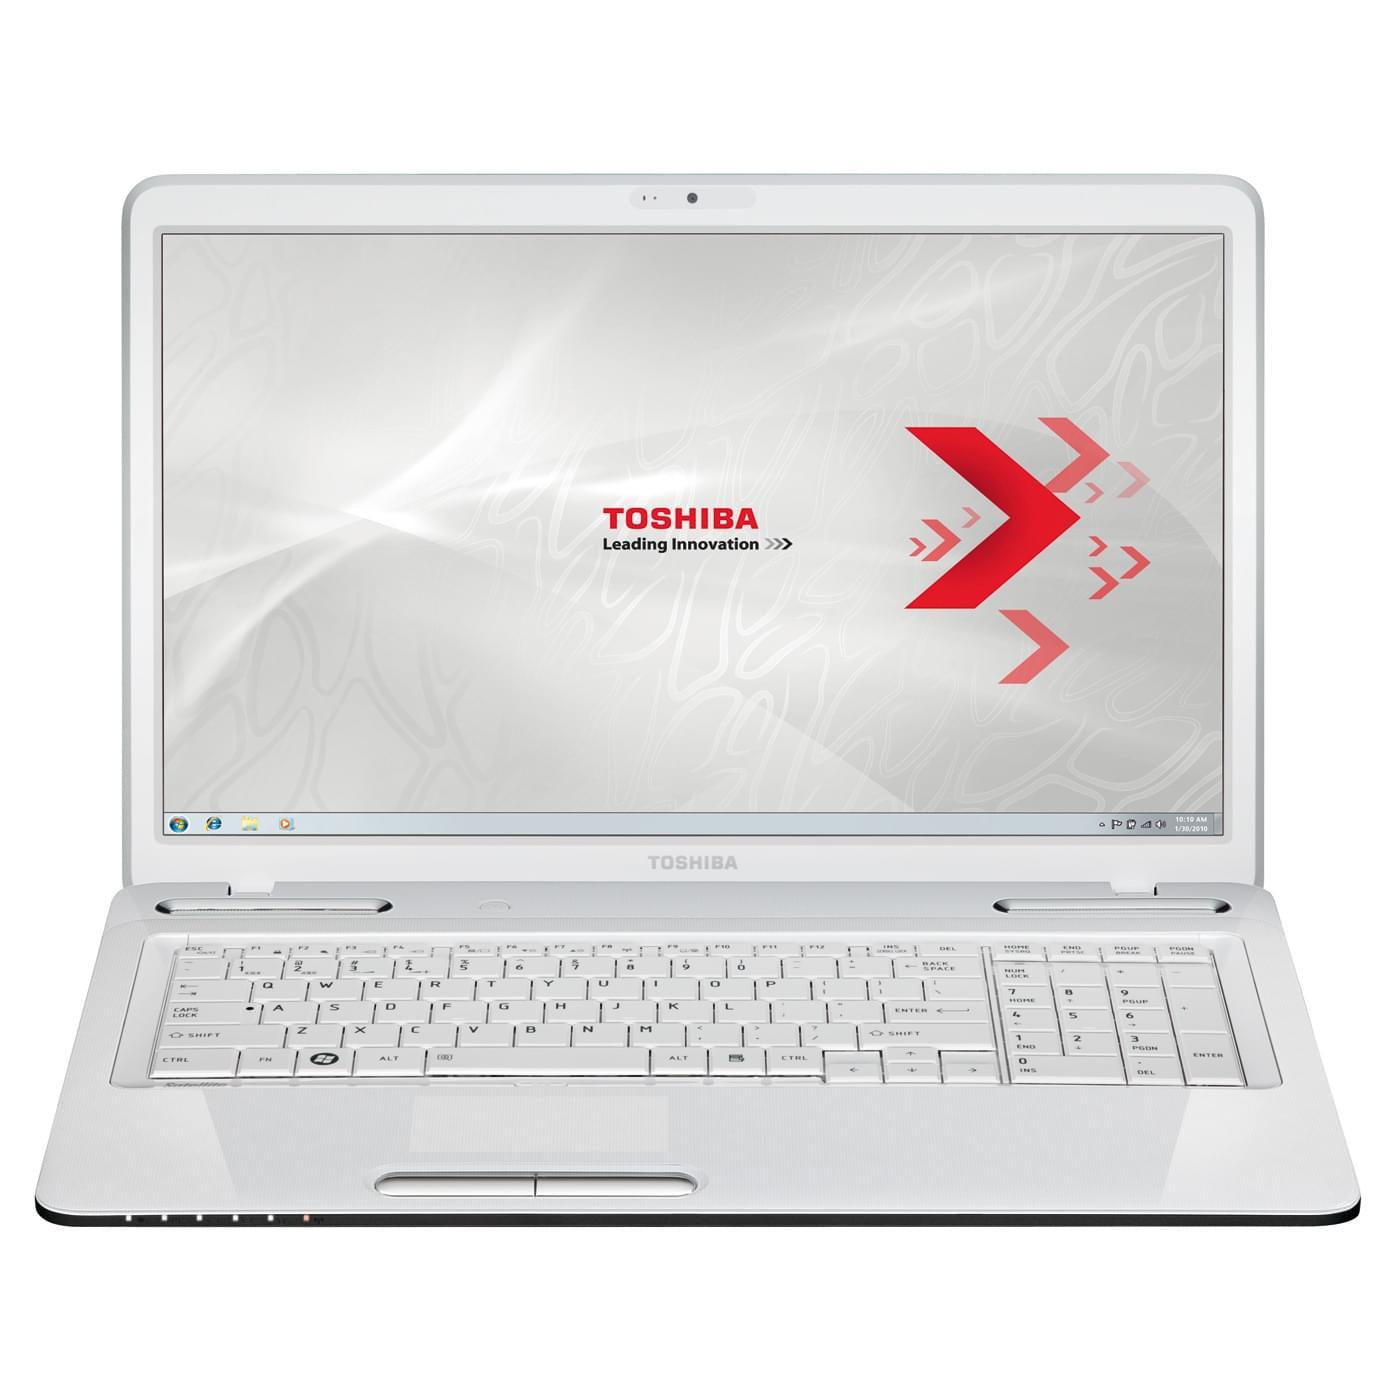 Toshiba L775-15X (PSK3WE-04N006FR) - Achat / Vente PC Portable sur Cybertek.fr - 0